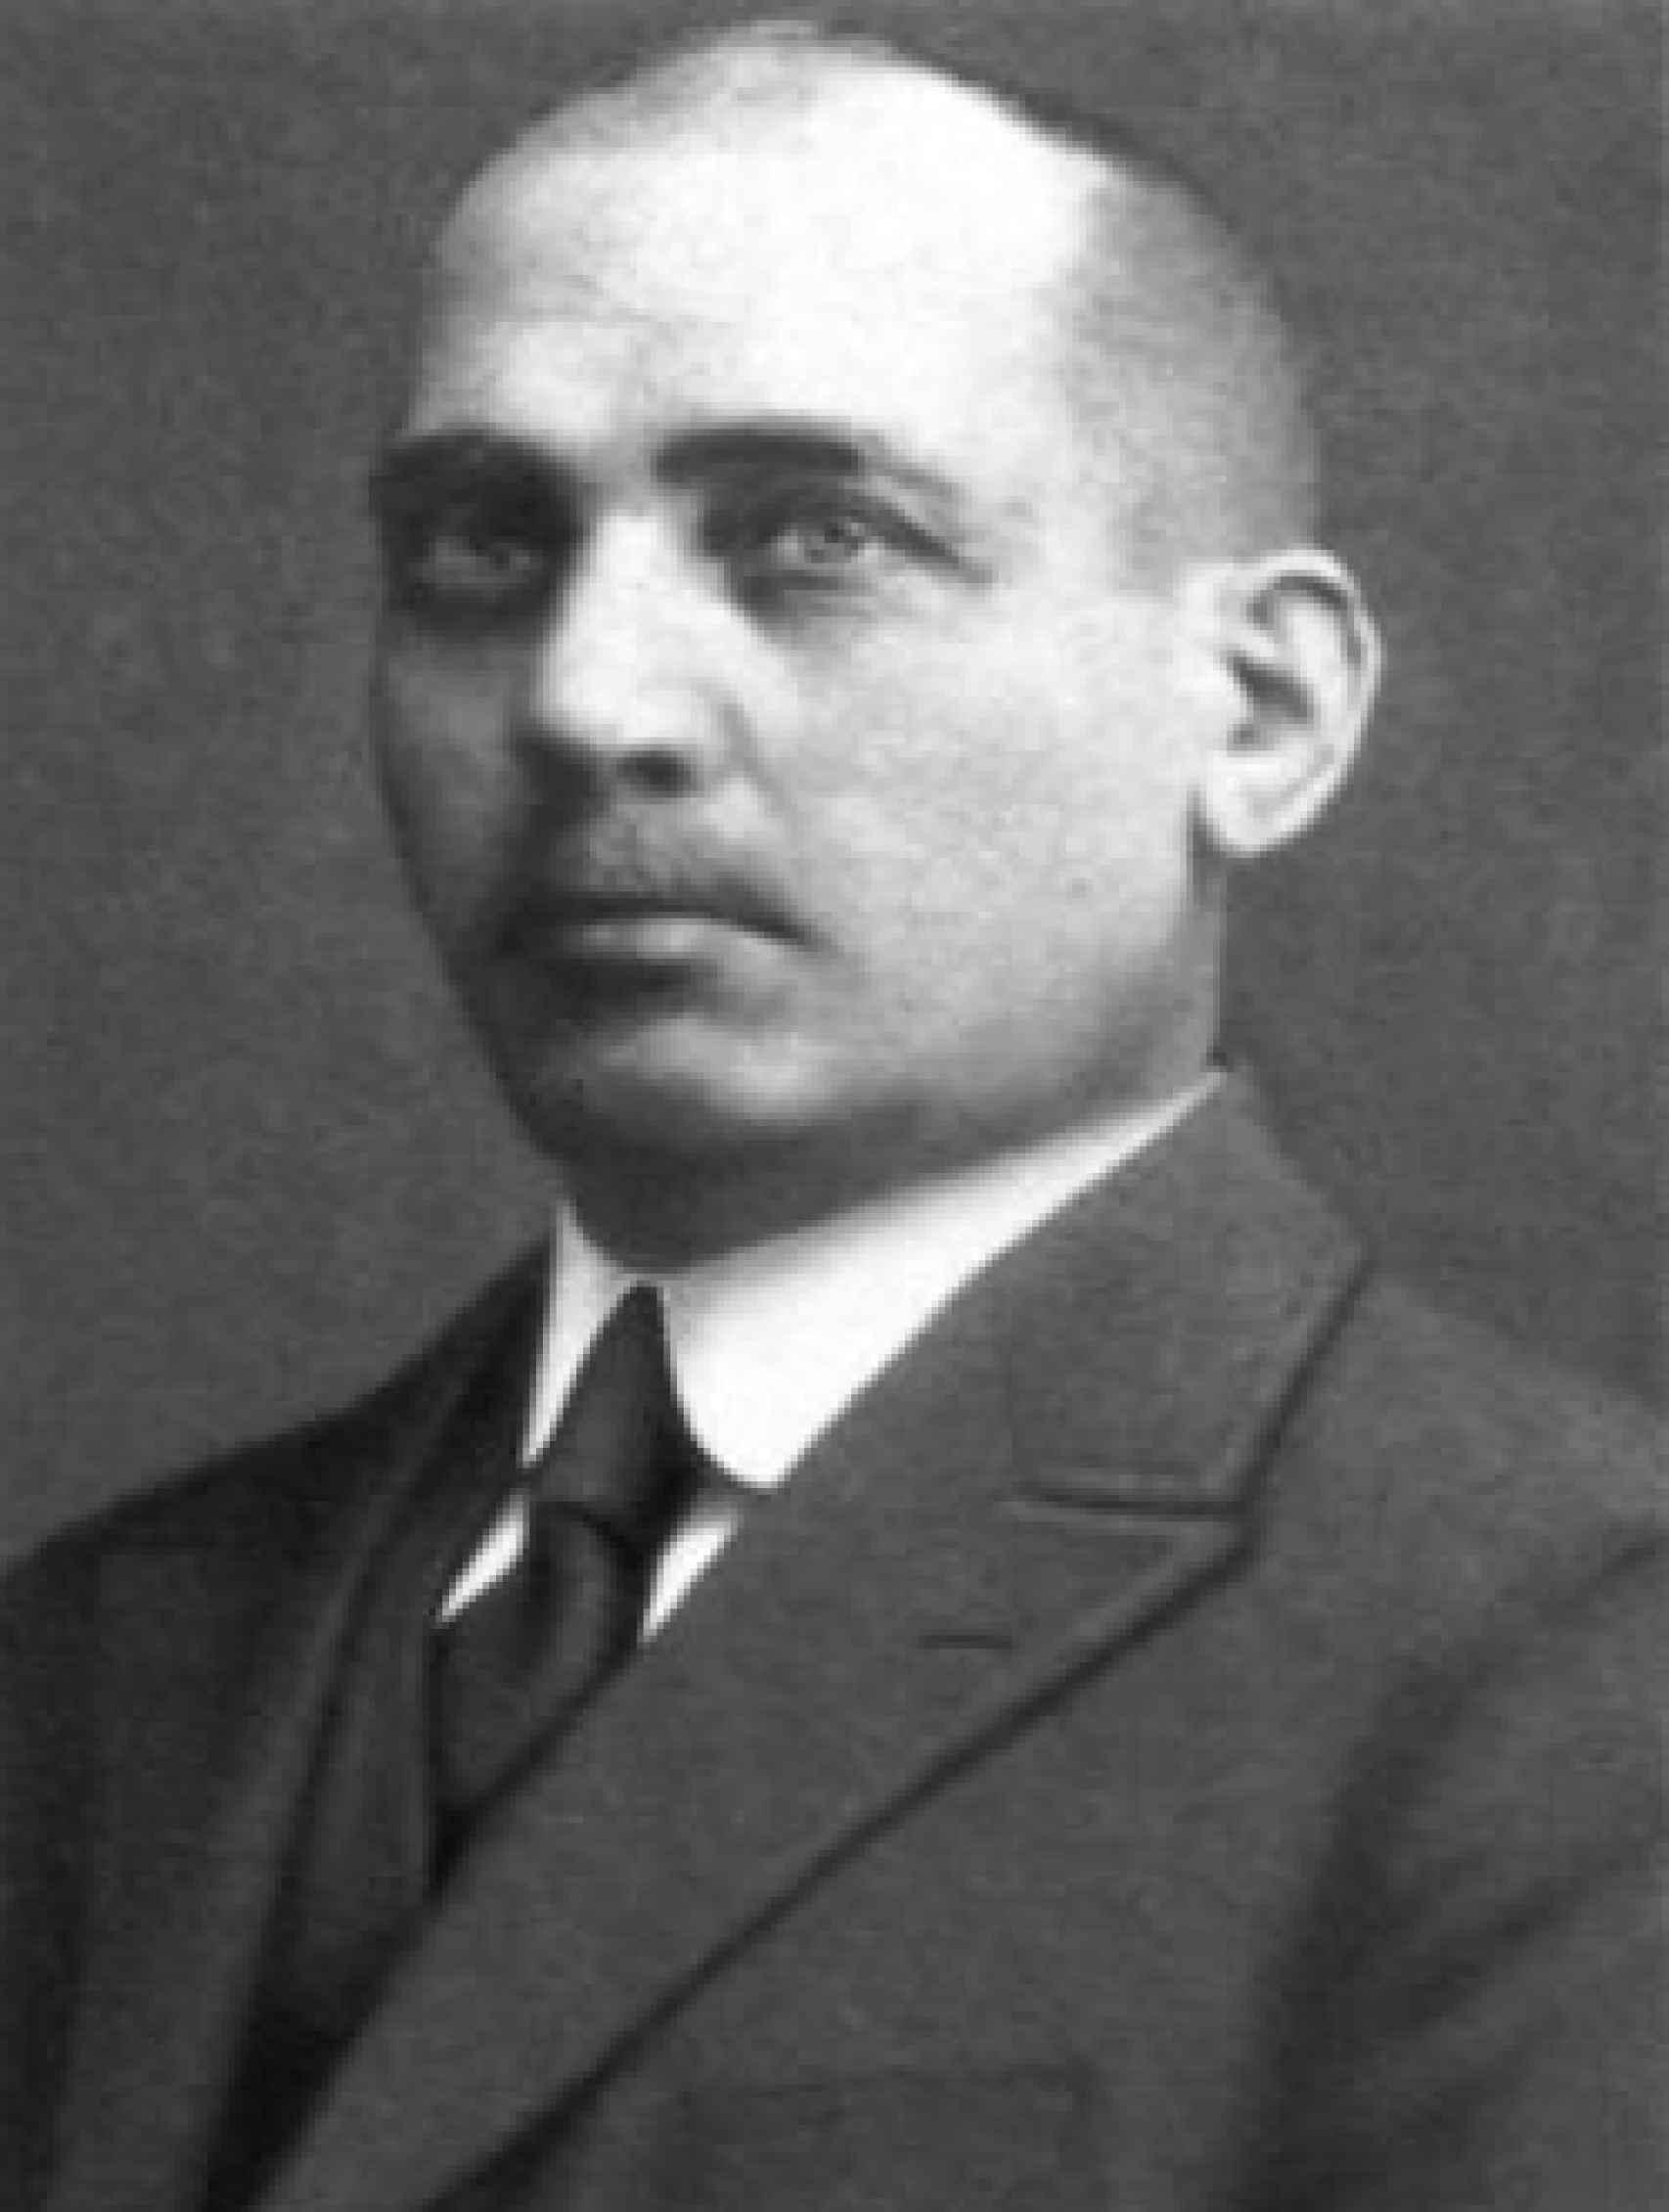 El fundador de la empresa, Isaac Carasso.